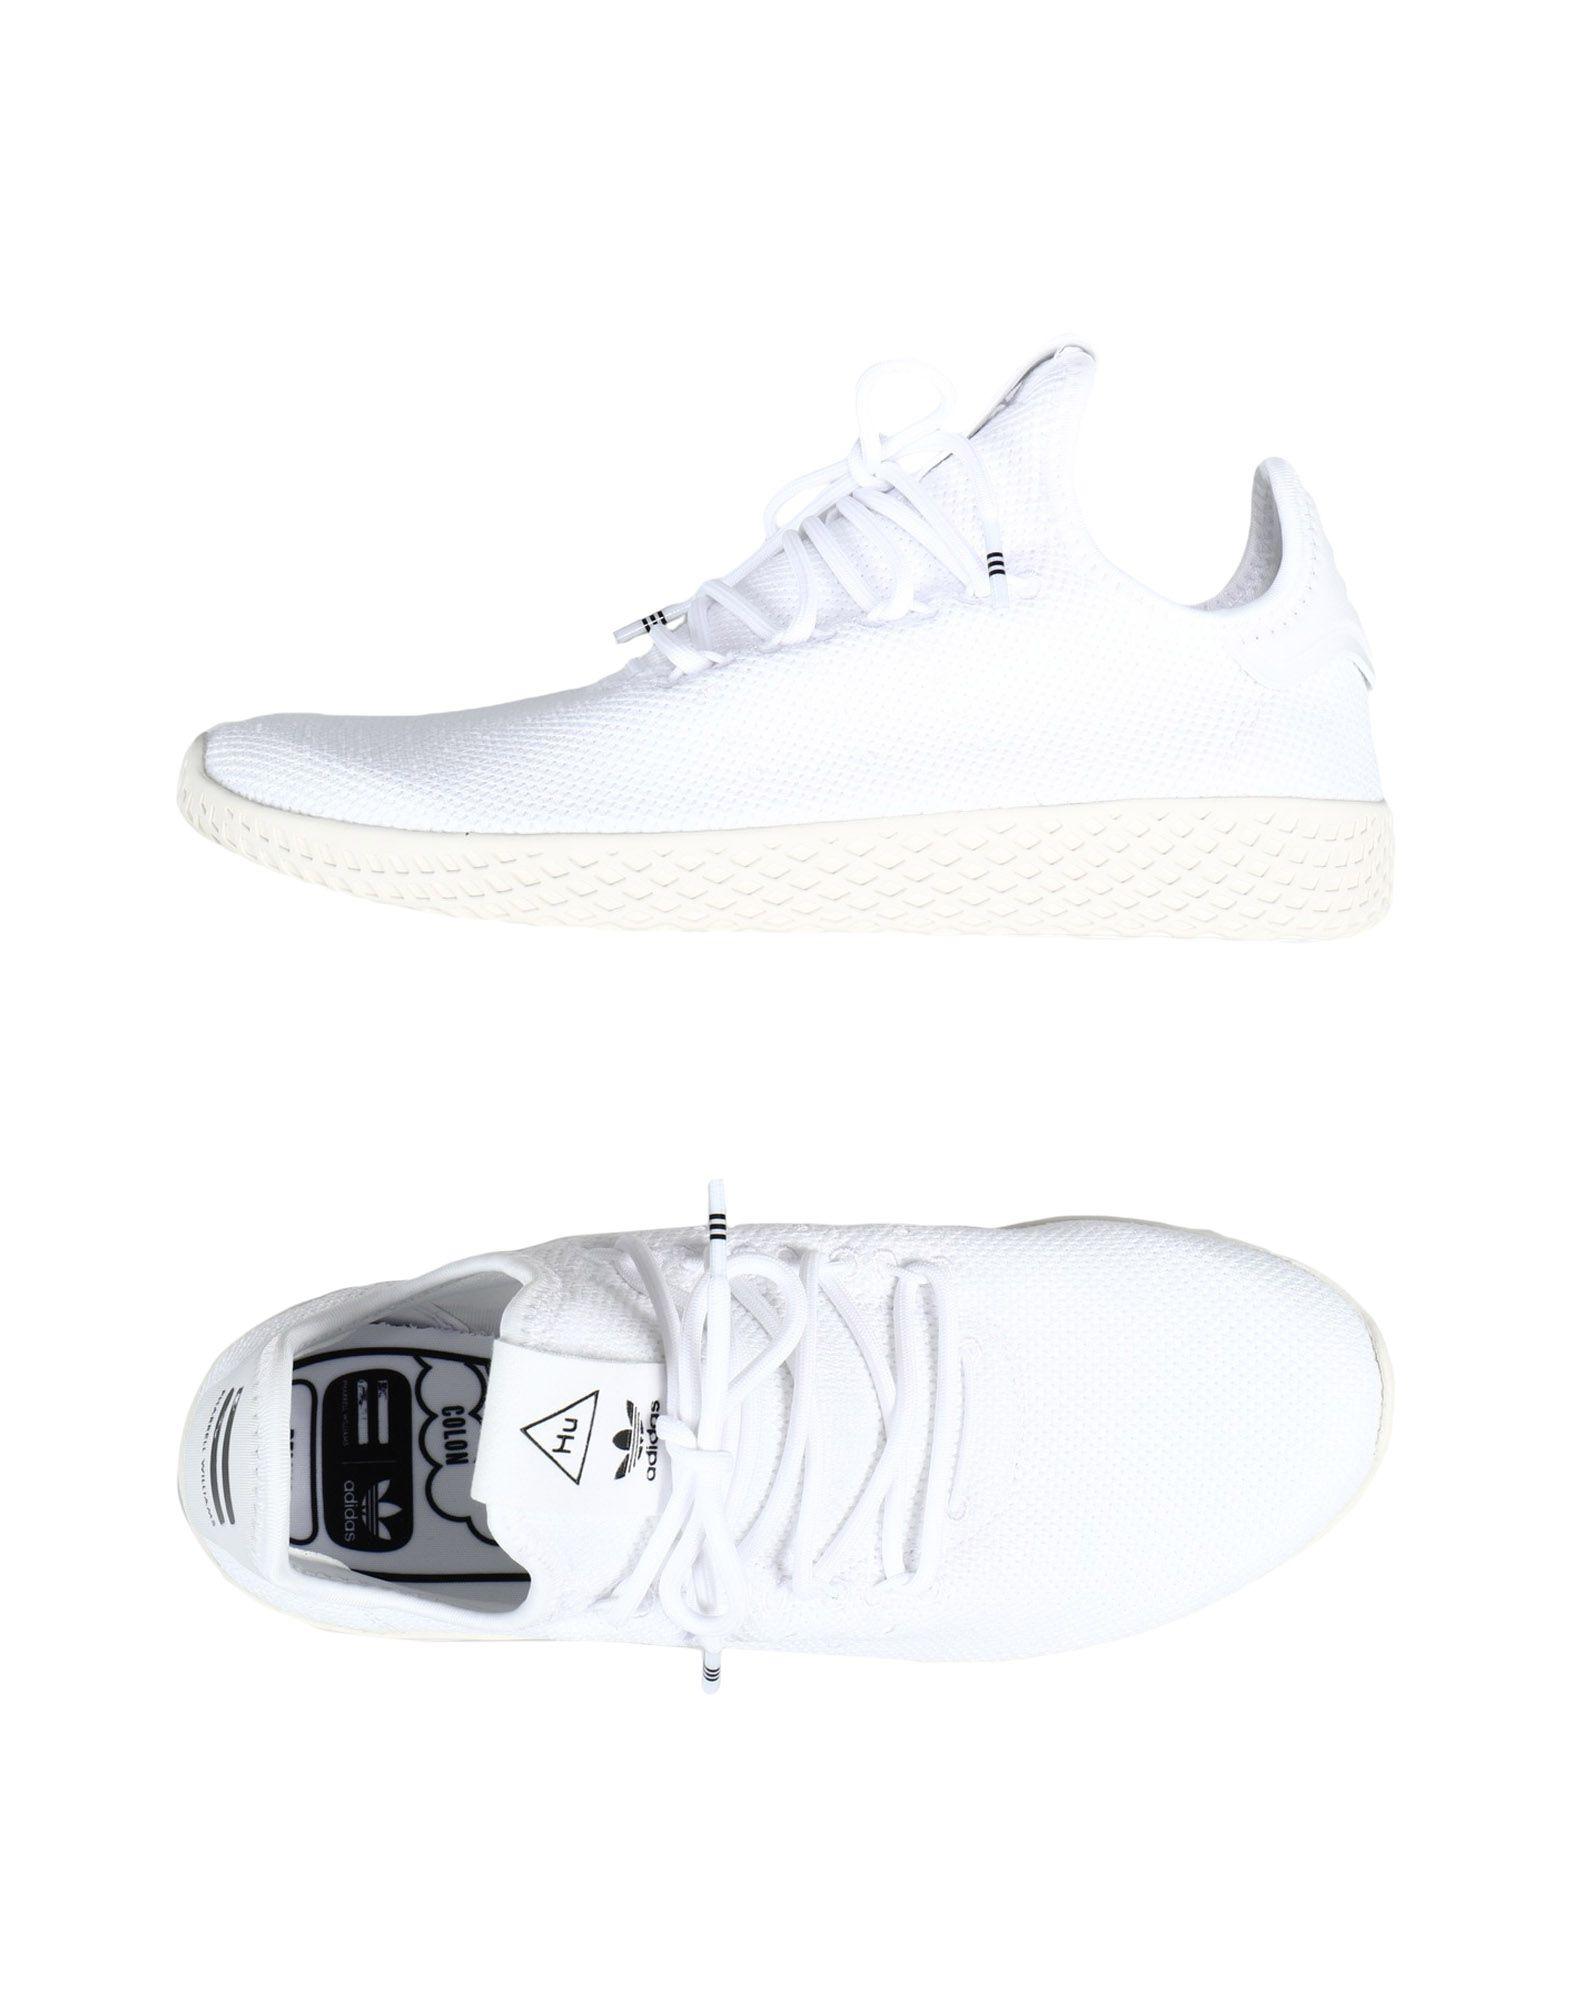 ADIDAS ORIGINALS by PHARRELL WILLIAMS Низкие кеды и кроссовки adidas originals by jeremy scott низкие кеды и кроссовки